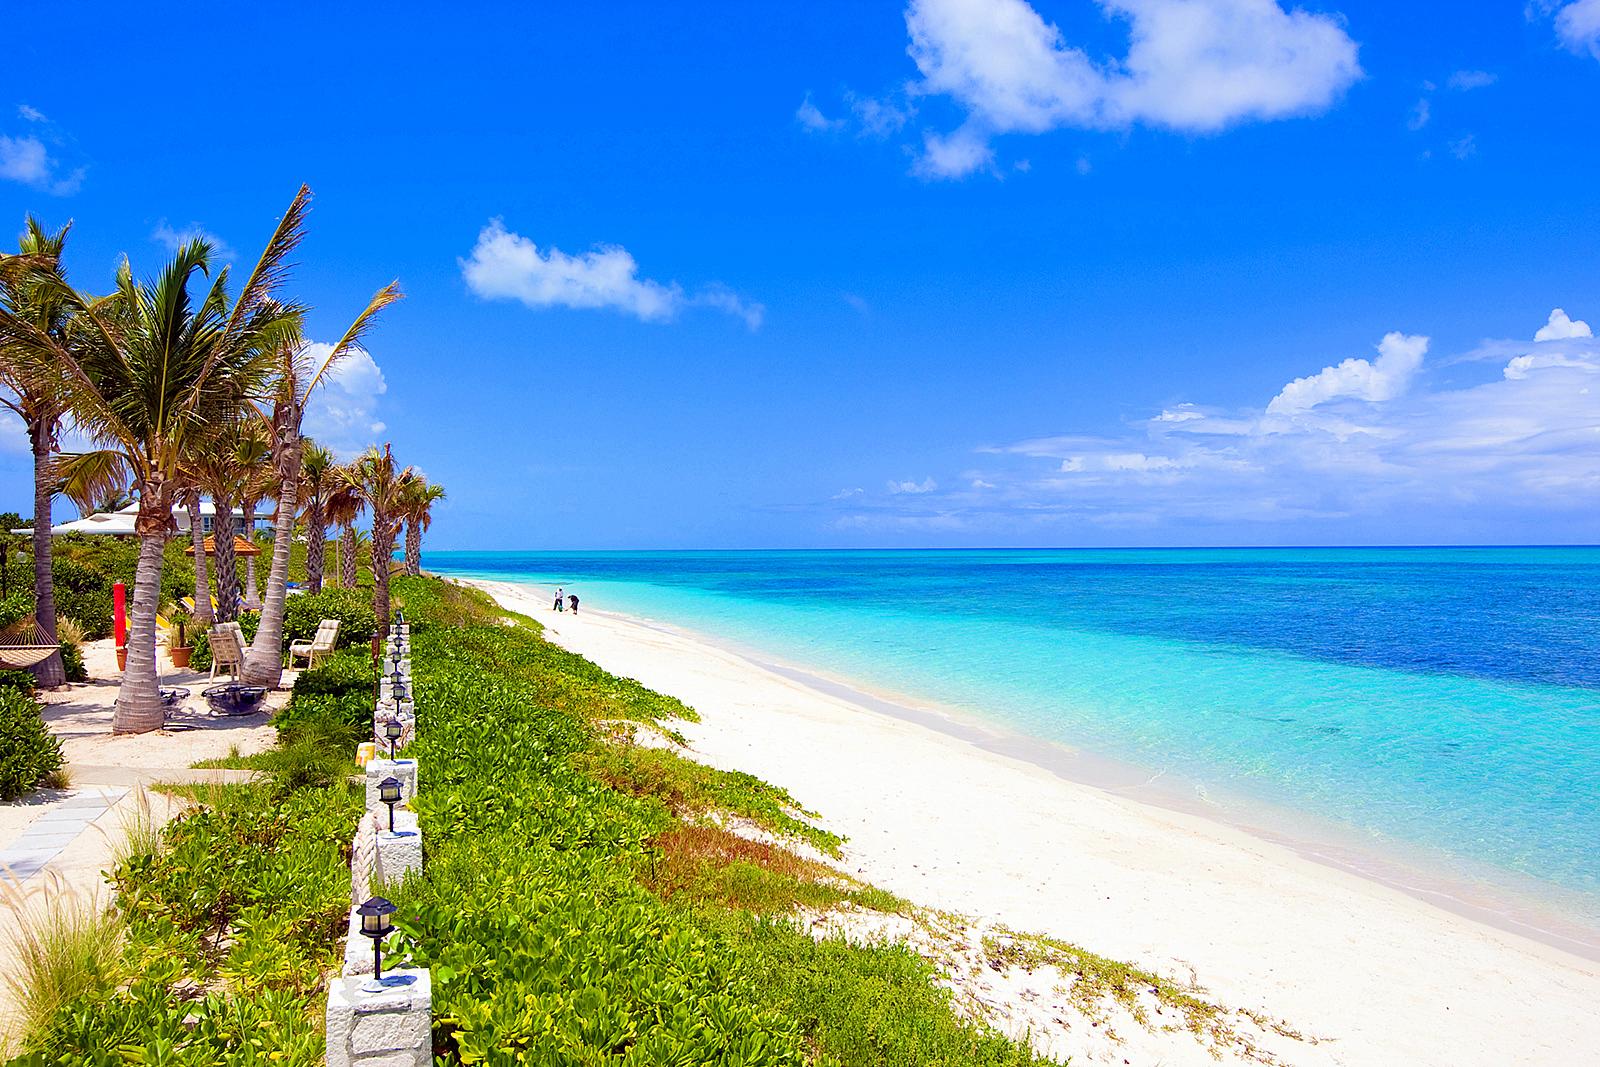 Beach -Turks & Caicos - Oliver's Travels